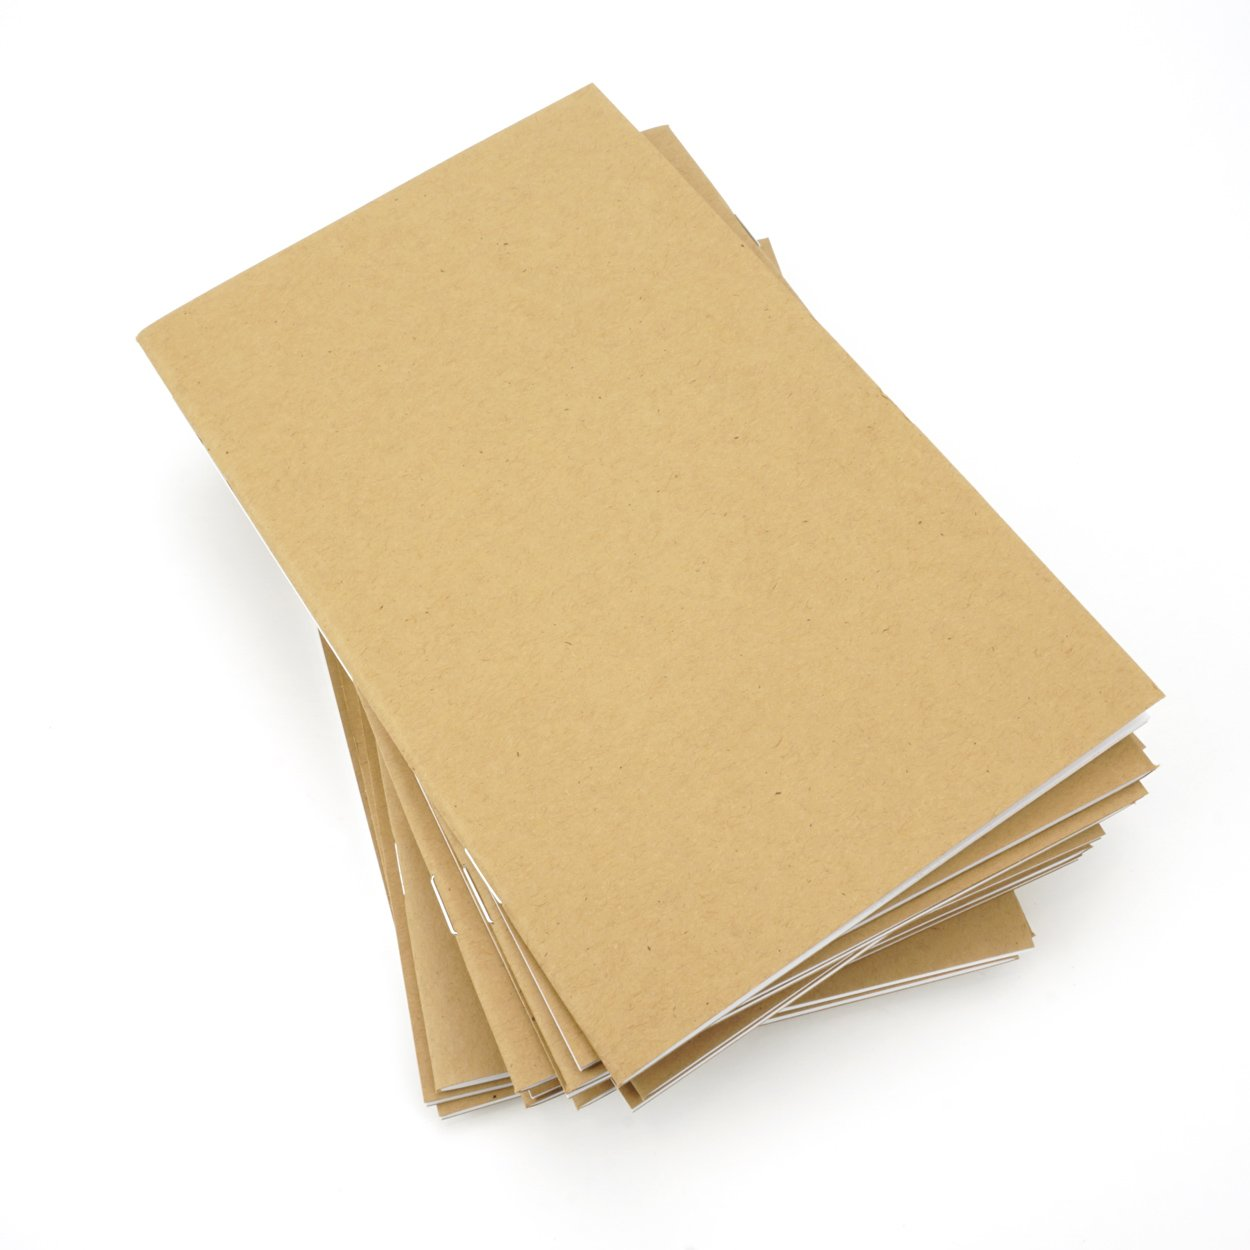 Kraft Notebook, 5 X 8 Inches, Set of 25, Bulk Notebooks, Kraft Brown, Blank Pages, Blank Cover, Medium Kraft Journals Bulk